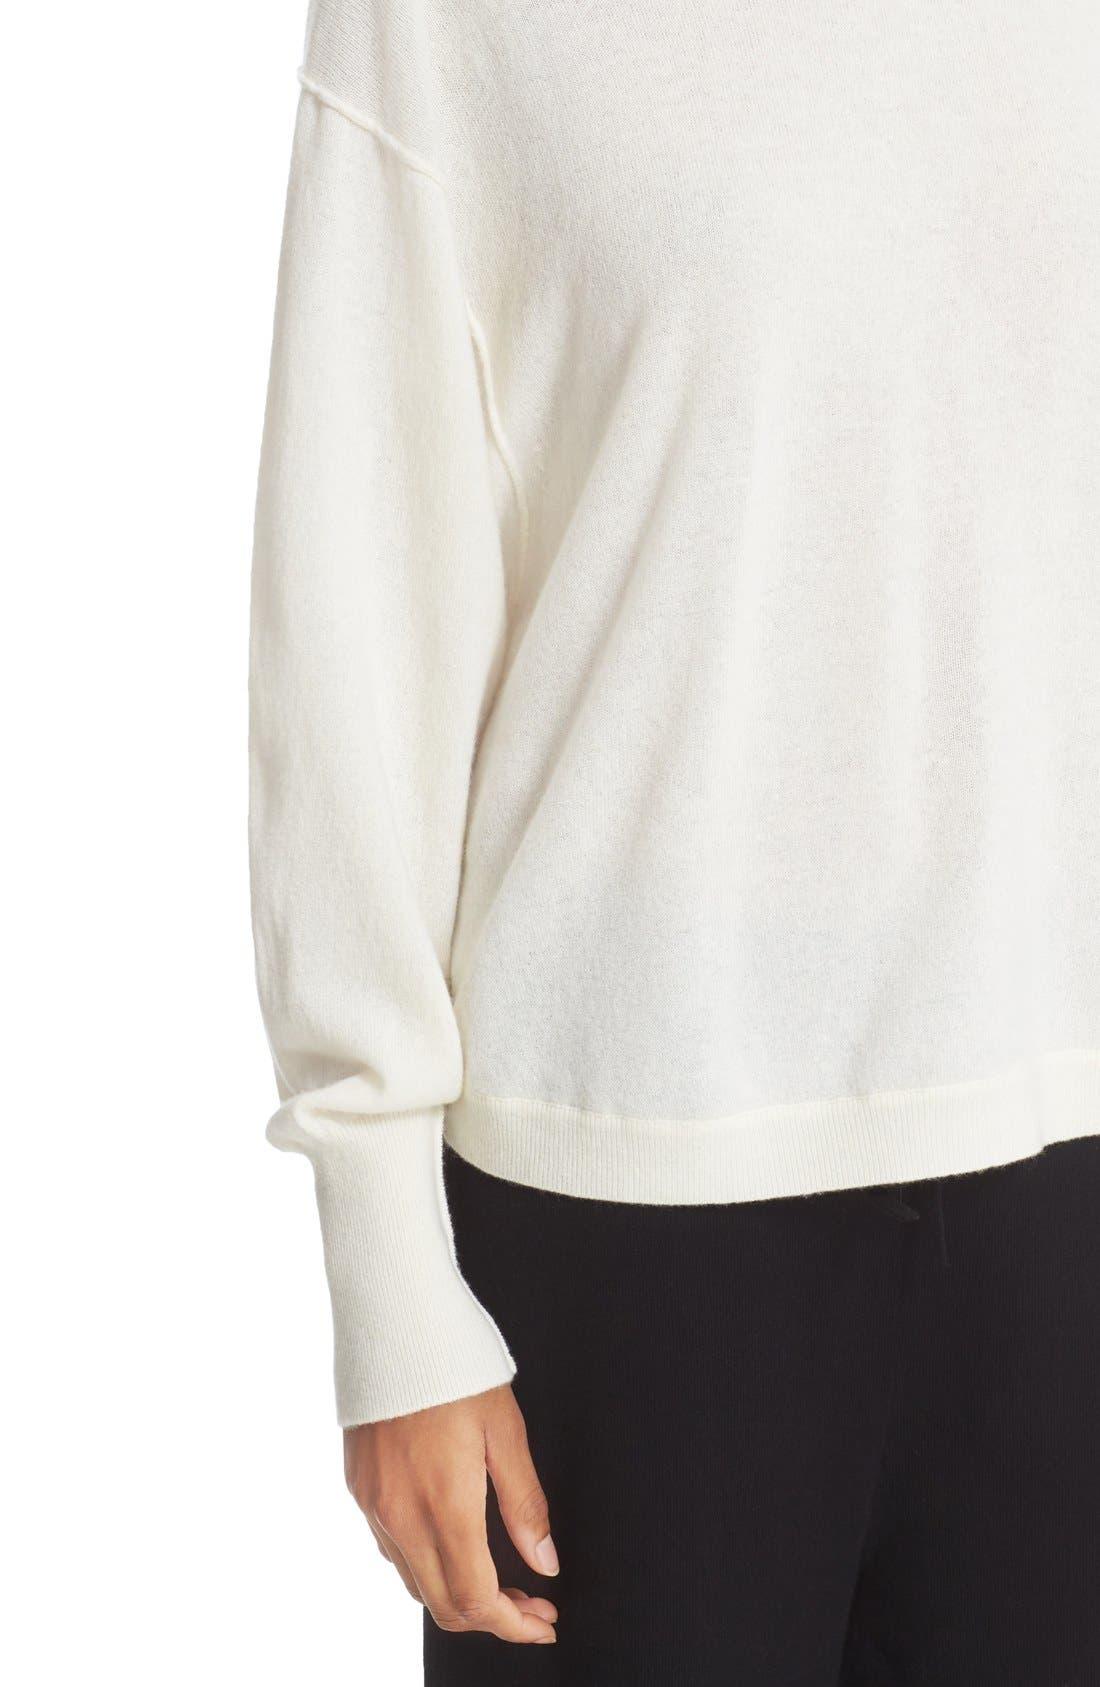 Shirttail Cashmere Sweater,                             Alternate thumbnail 4, color,                             101